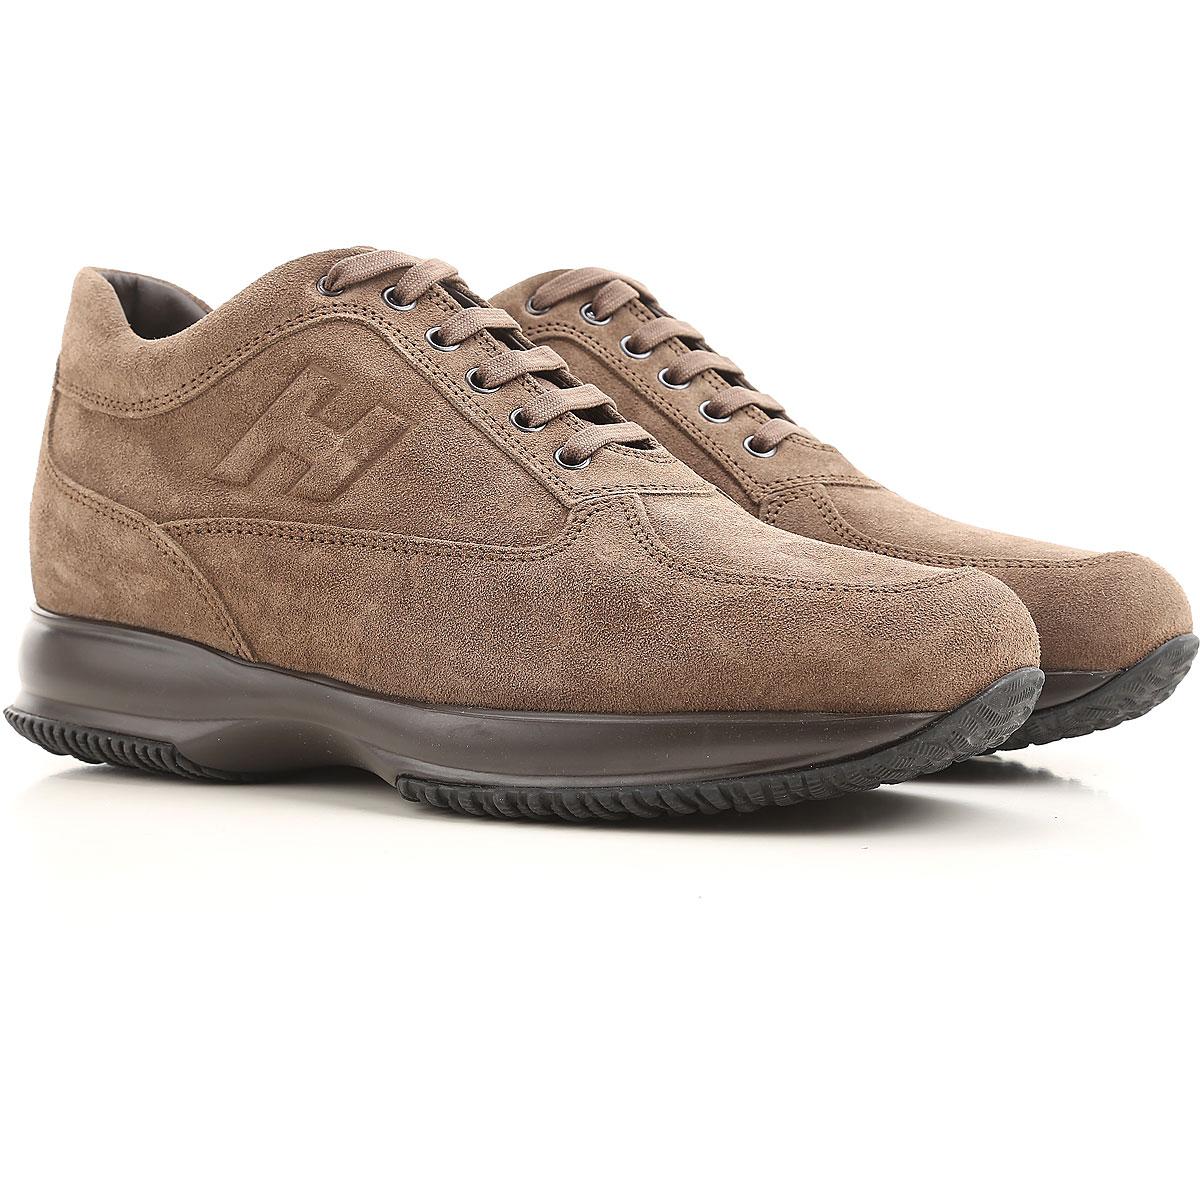 pulizia scarpe scamosciate hogan